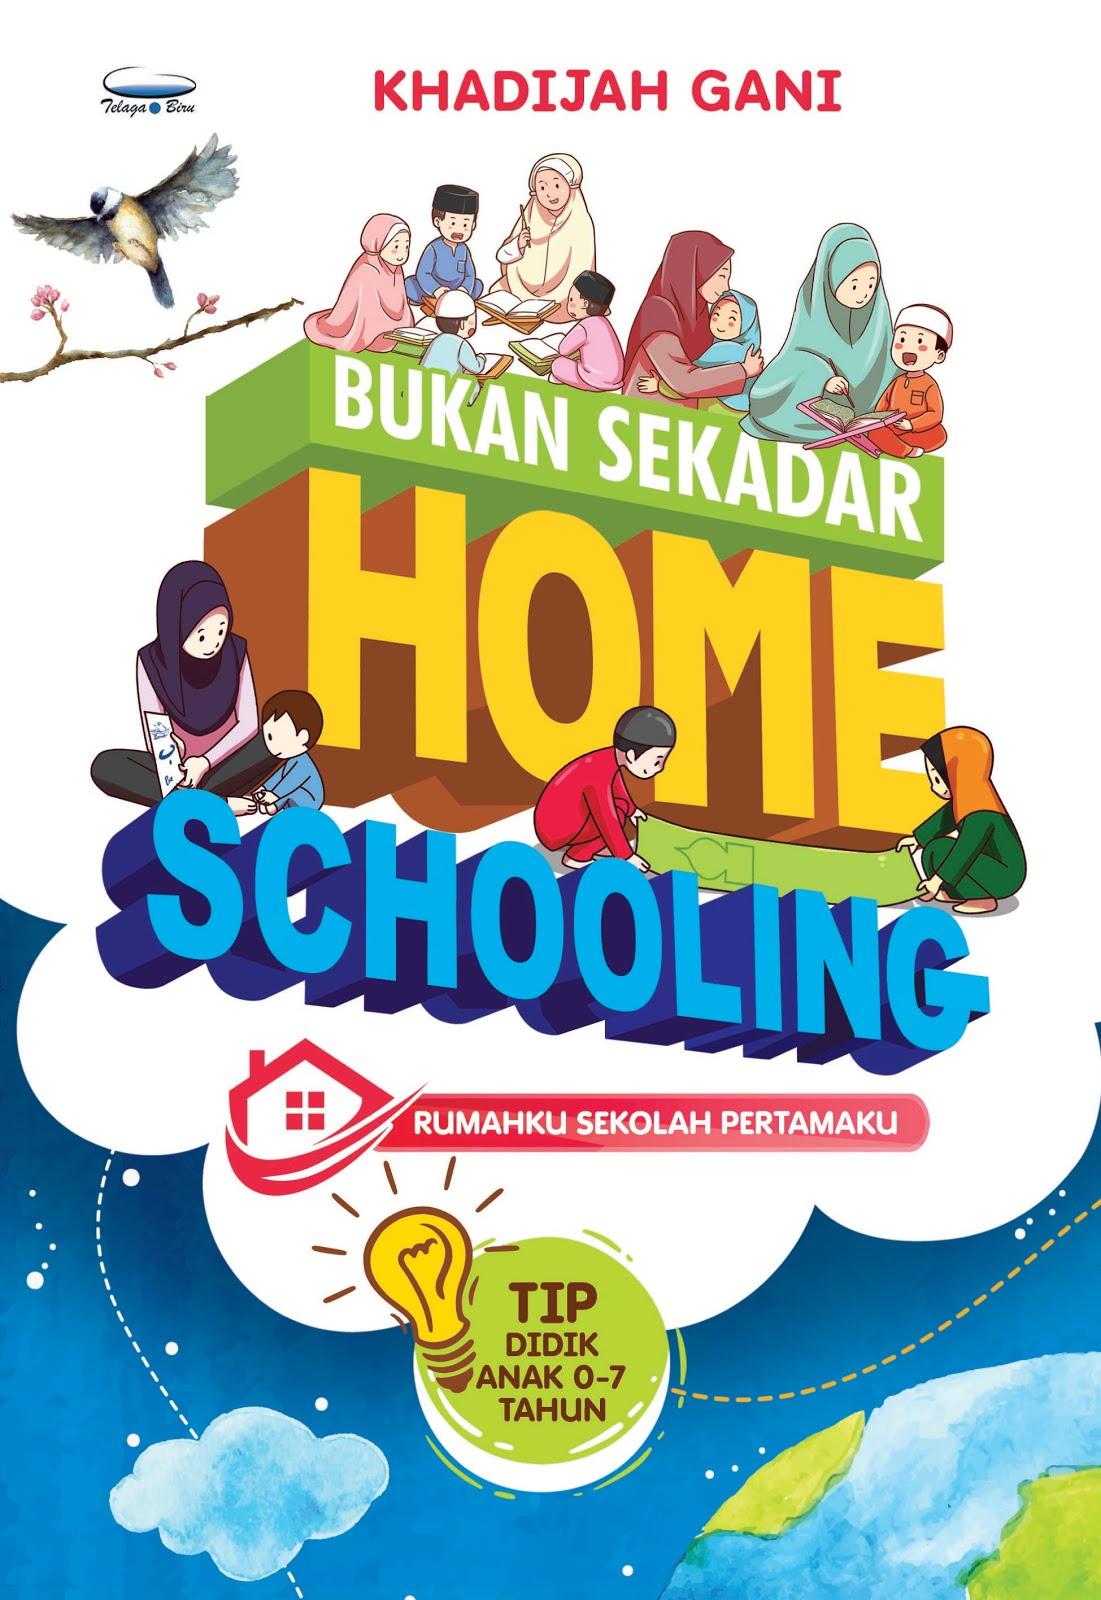 (2017) BUKU PERTAMAKU : Bukan Sekadar Homeschooling ~ Rumahku Sekolah Pertamaku